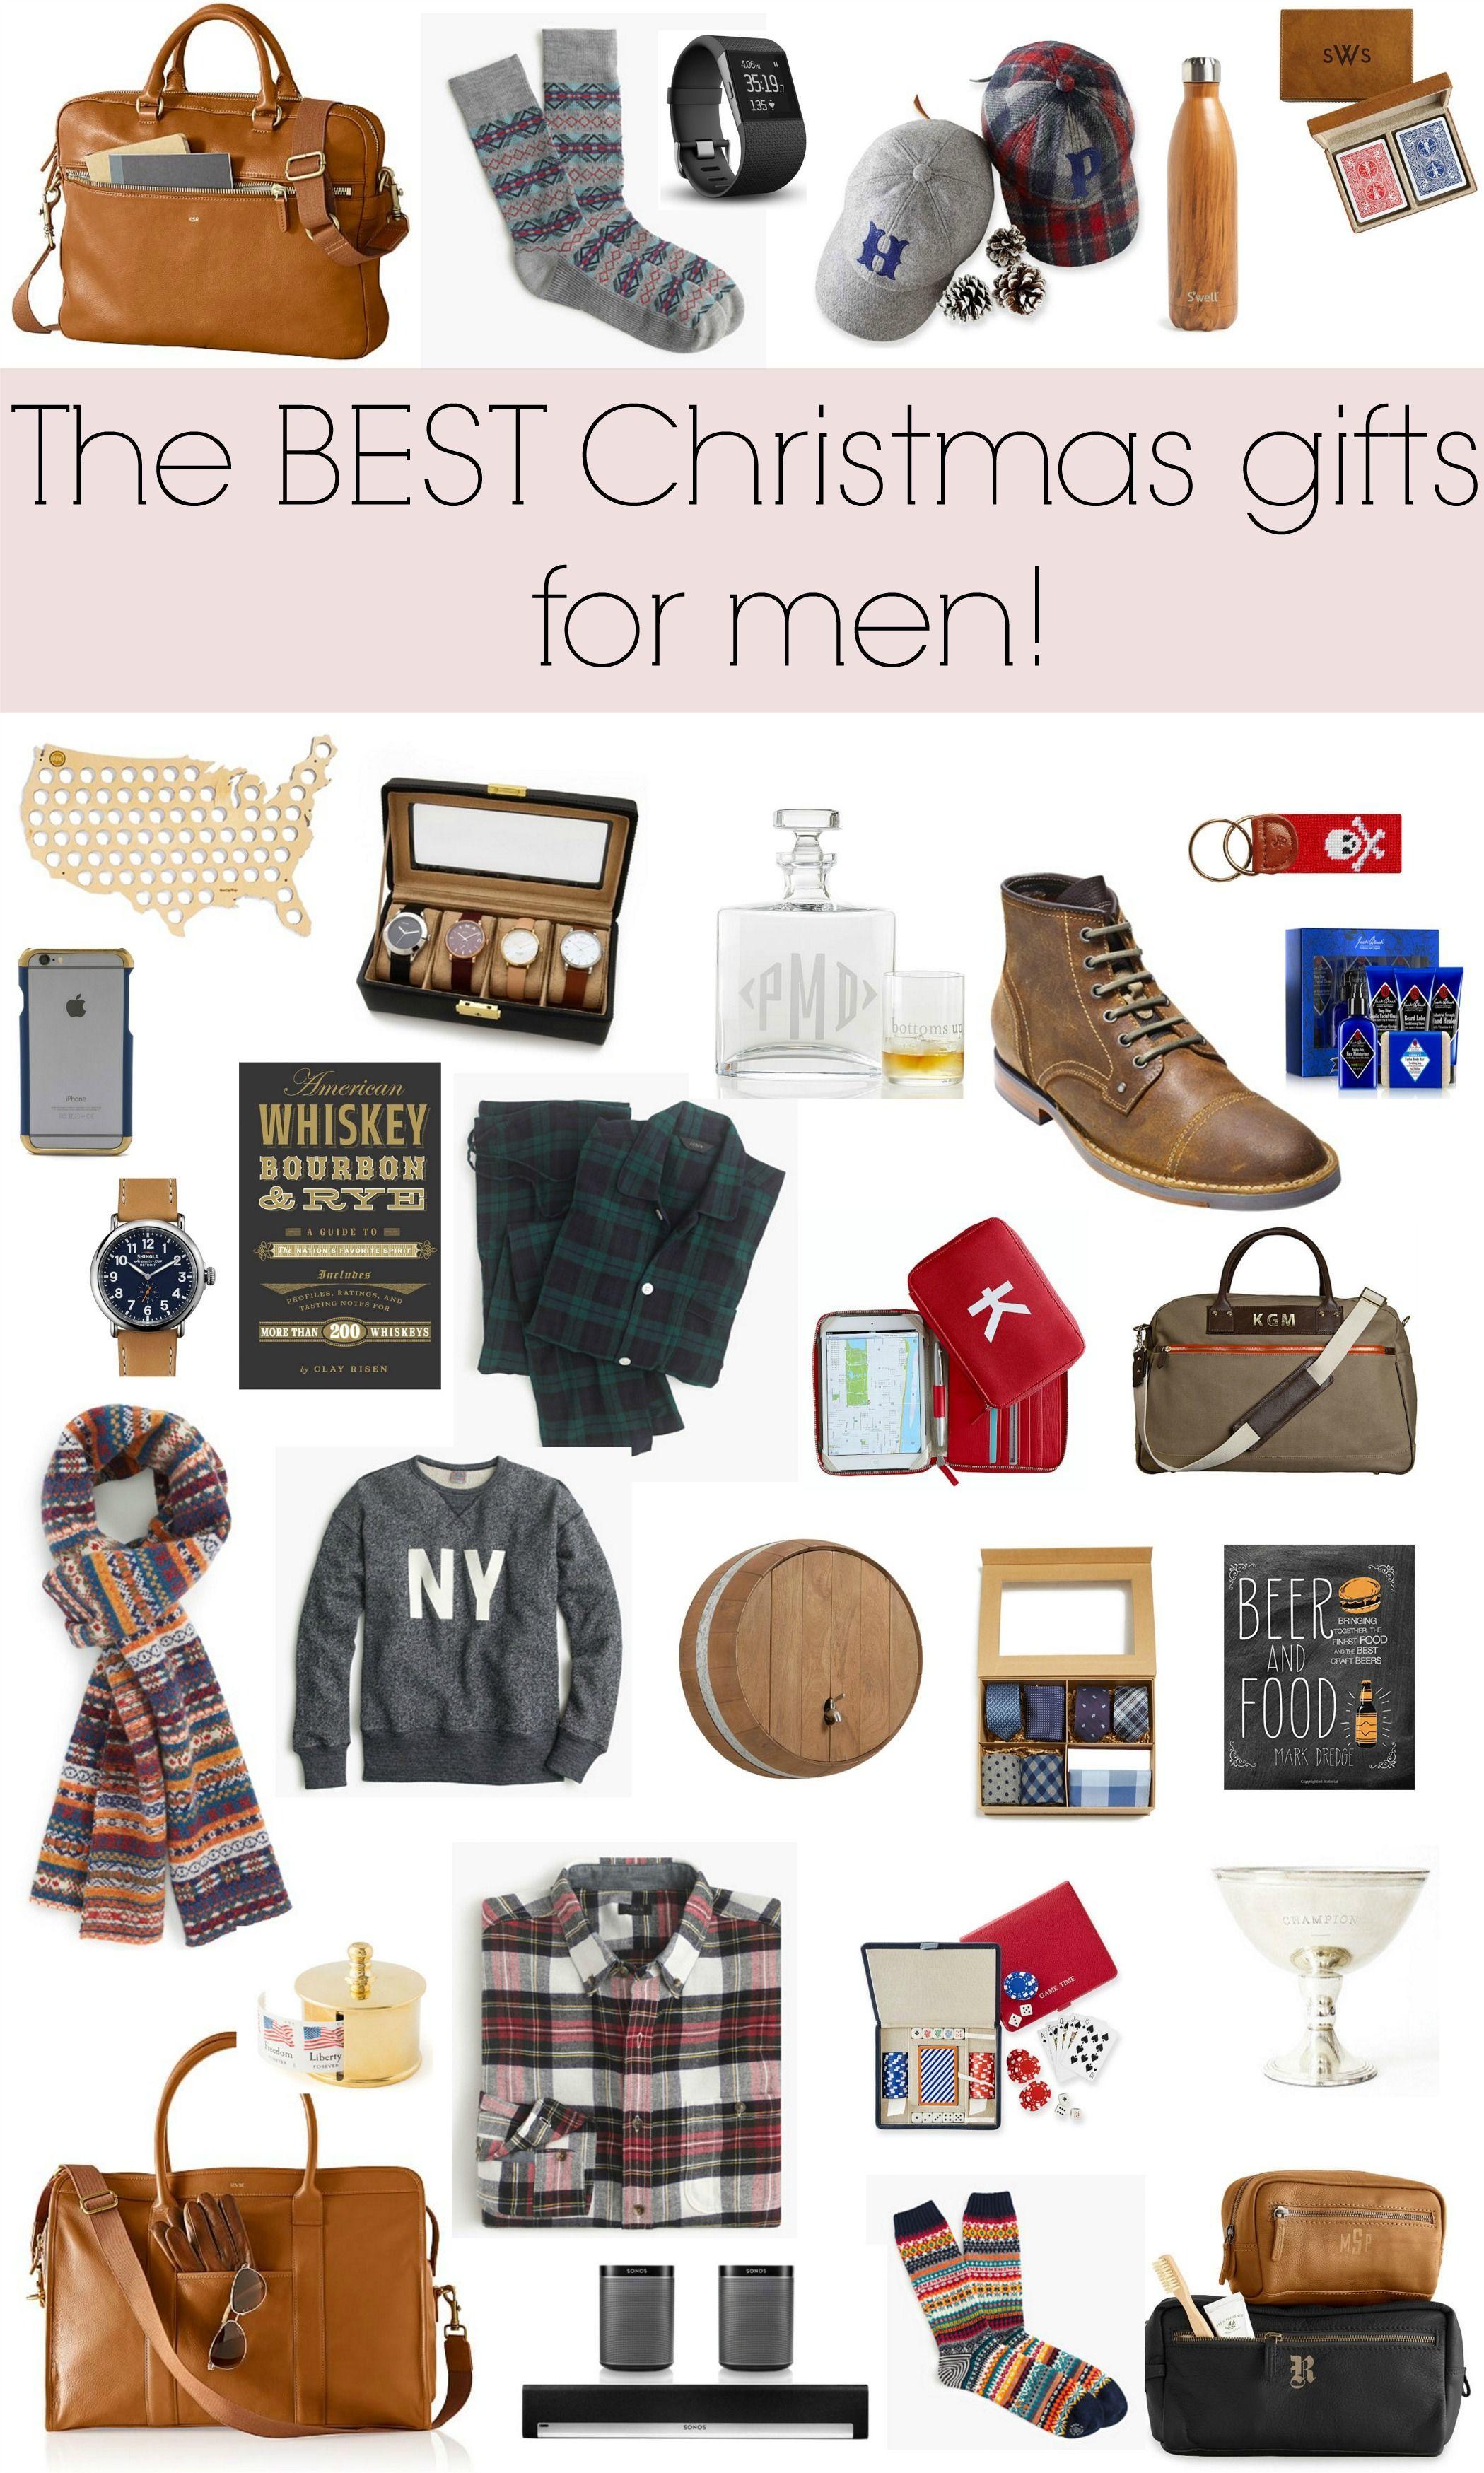 Christmas gift ideas for men! Holiday Gift Guide via